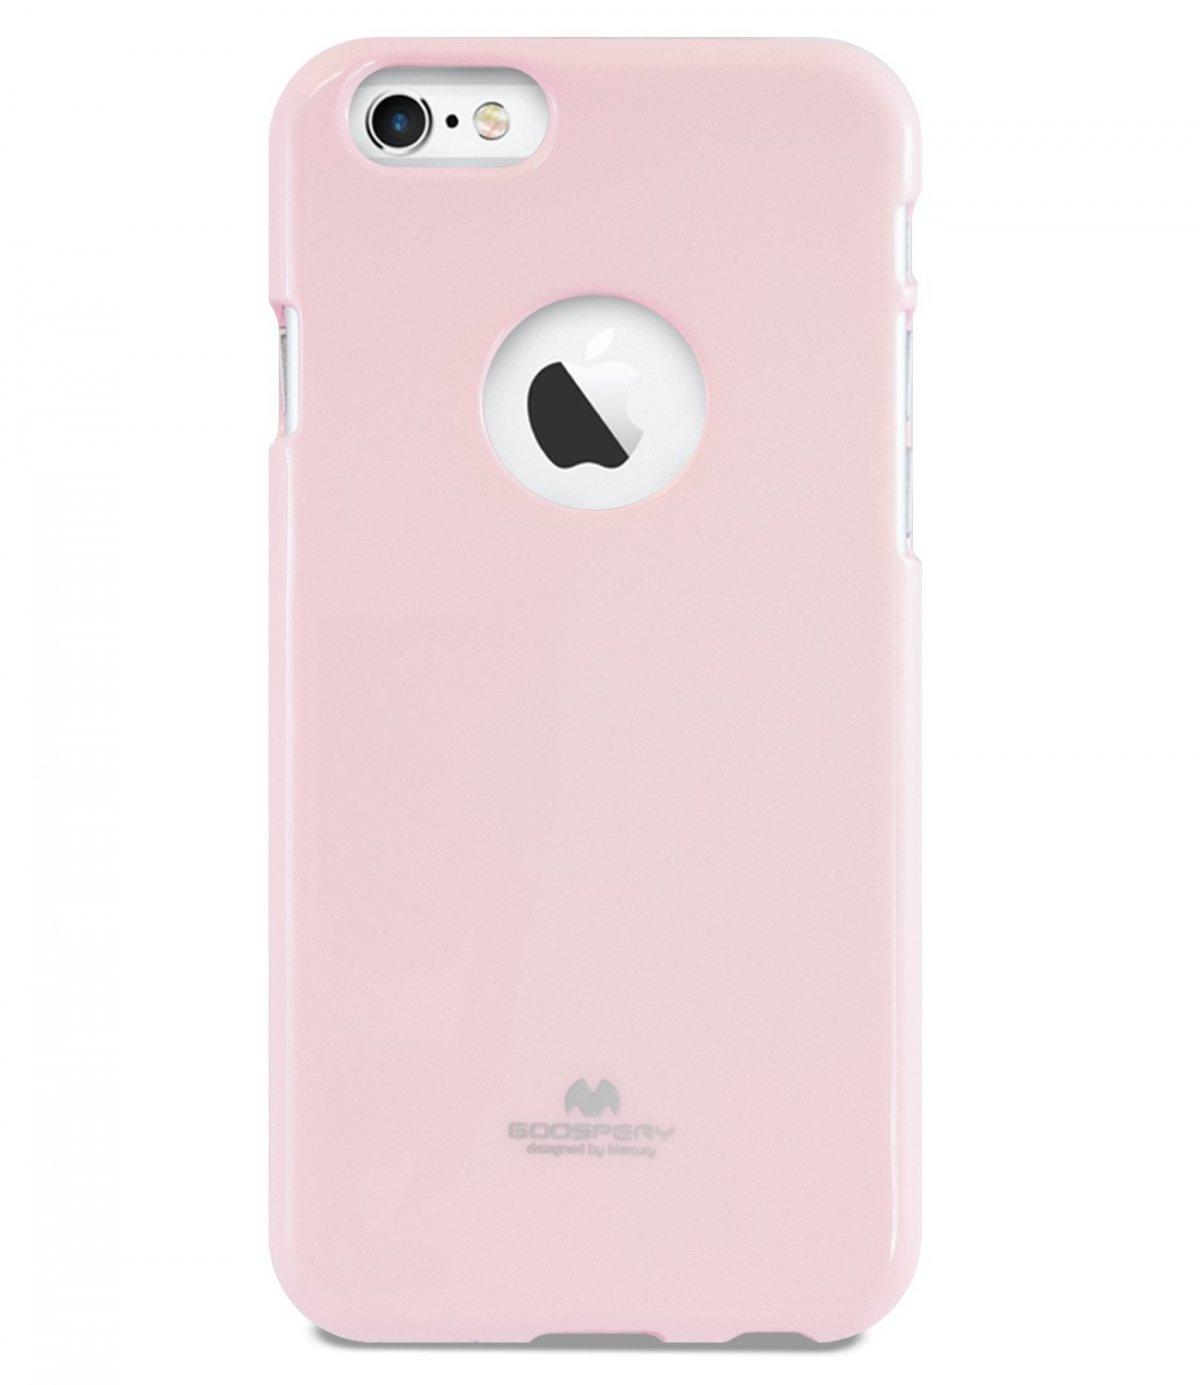 Silikonový obal / kryt Jelly Case Goospery Mercury Apple iPhone 6s Plus / 6 Plus - Světle růžový